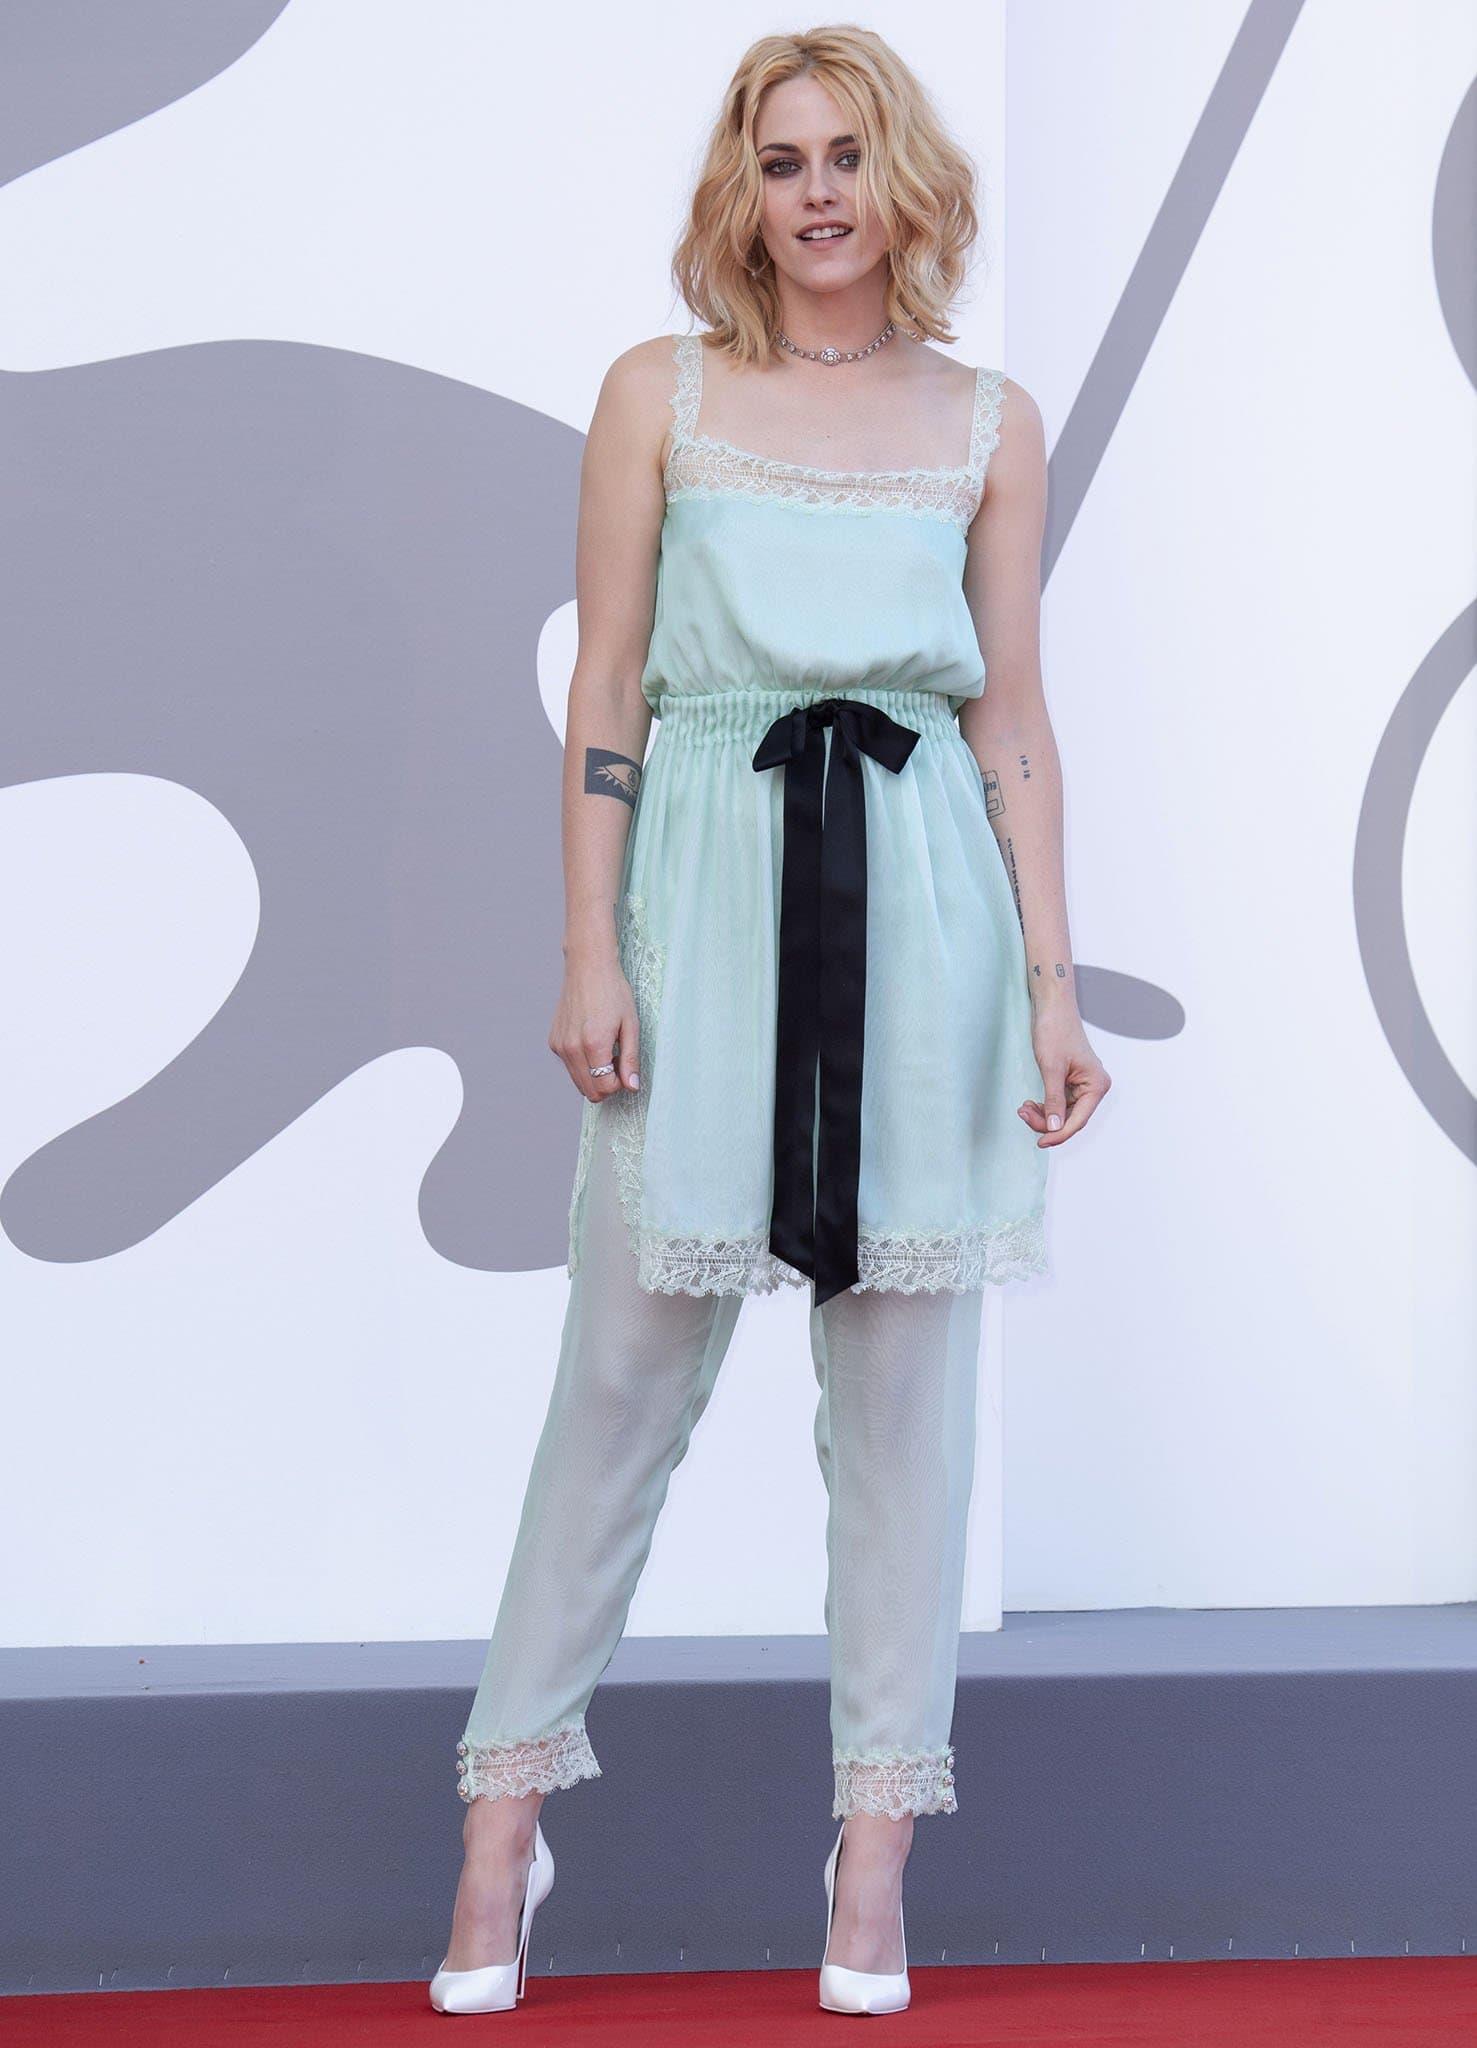 Kristen Stewart attends the Spencer movie premiere during the 2021 Venice Film Festival in Italy on September 3, 2021